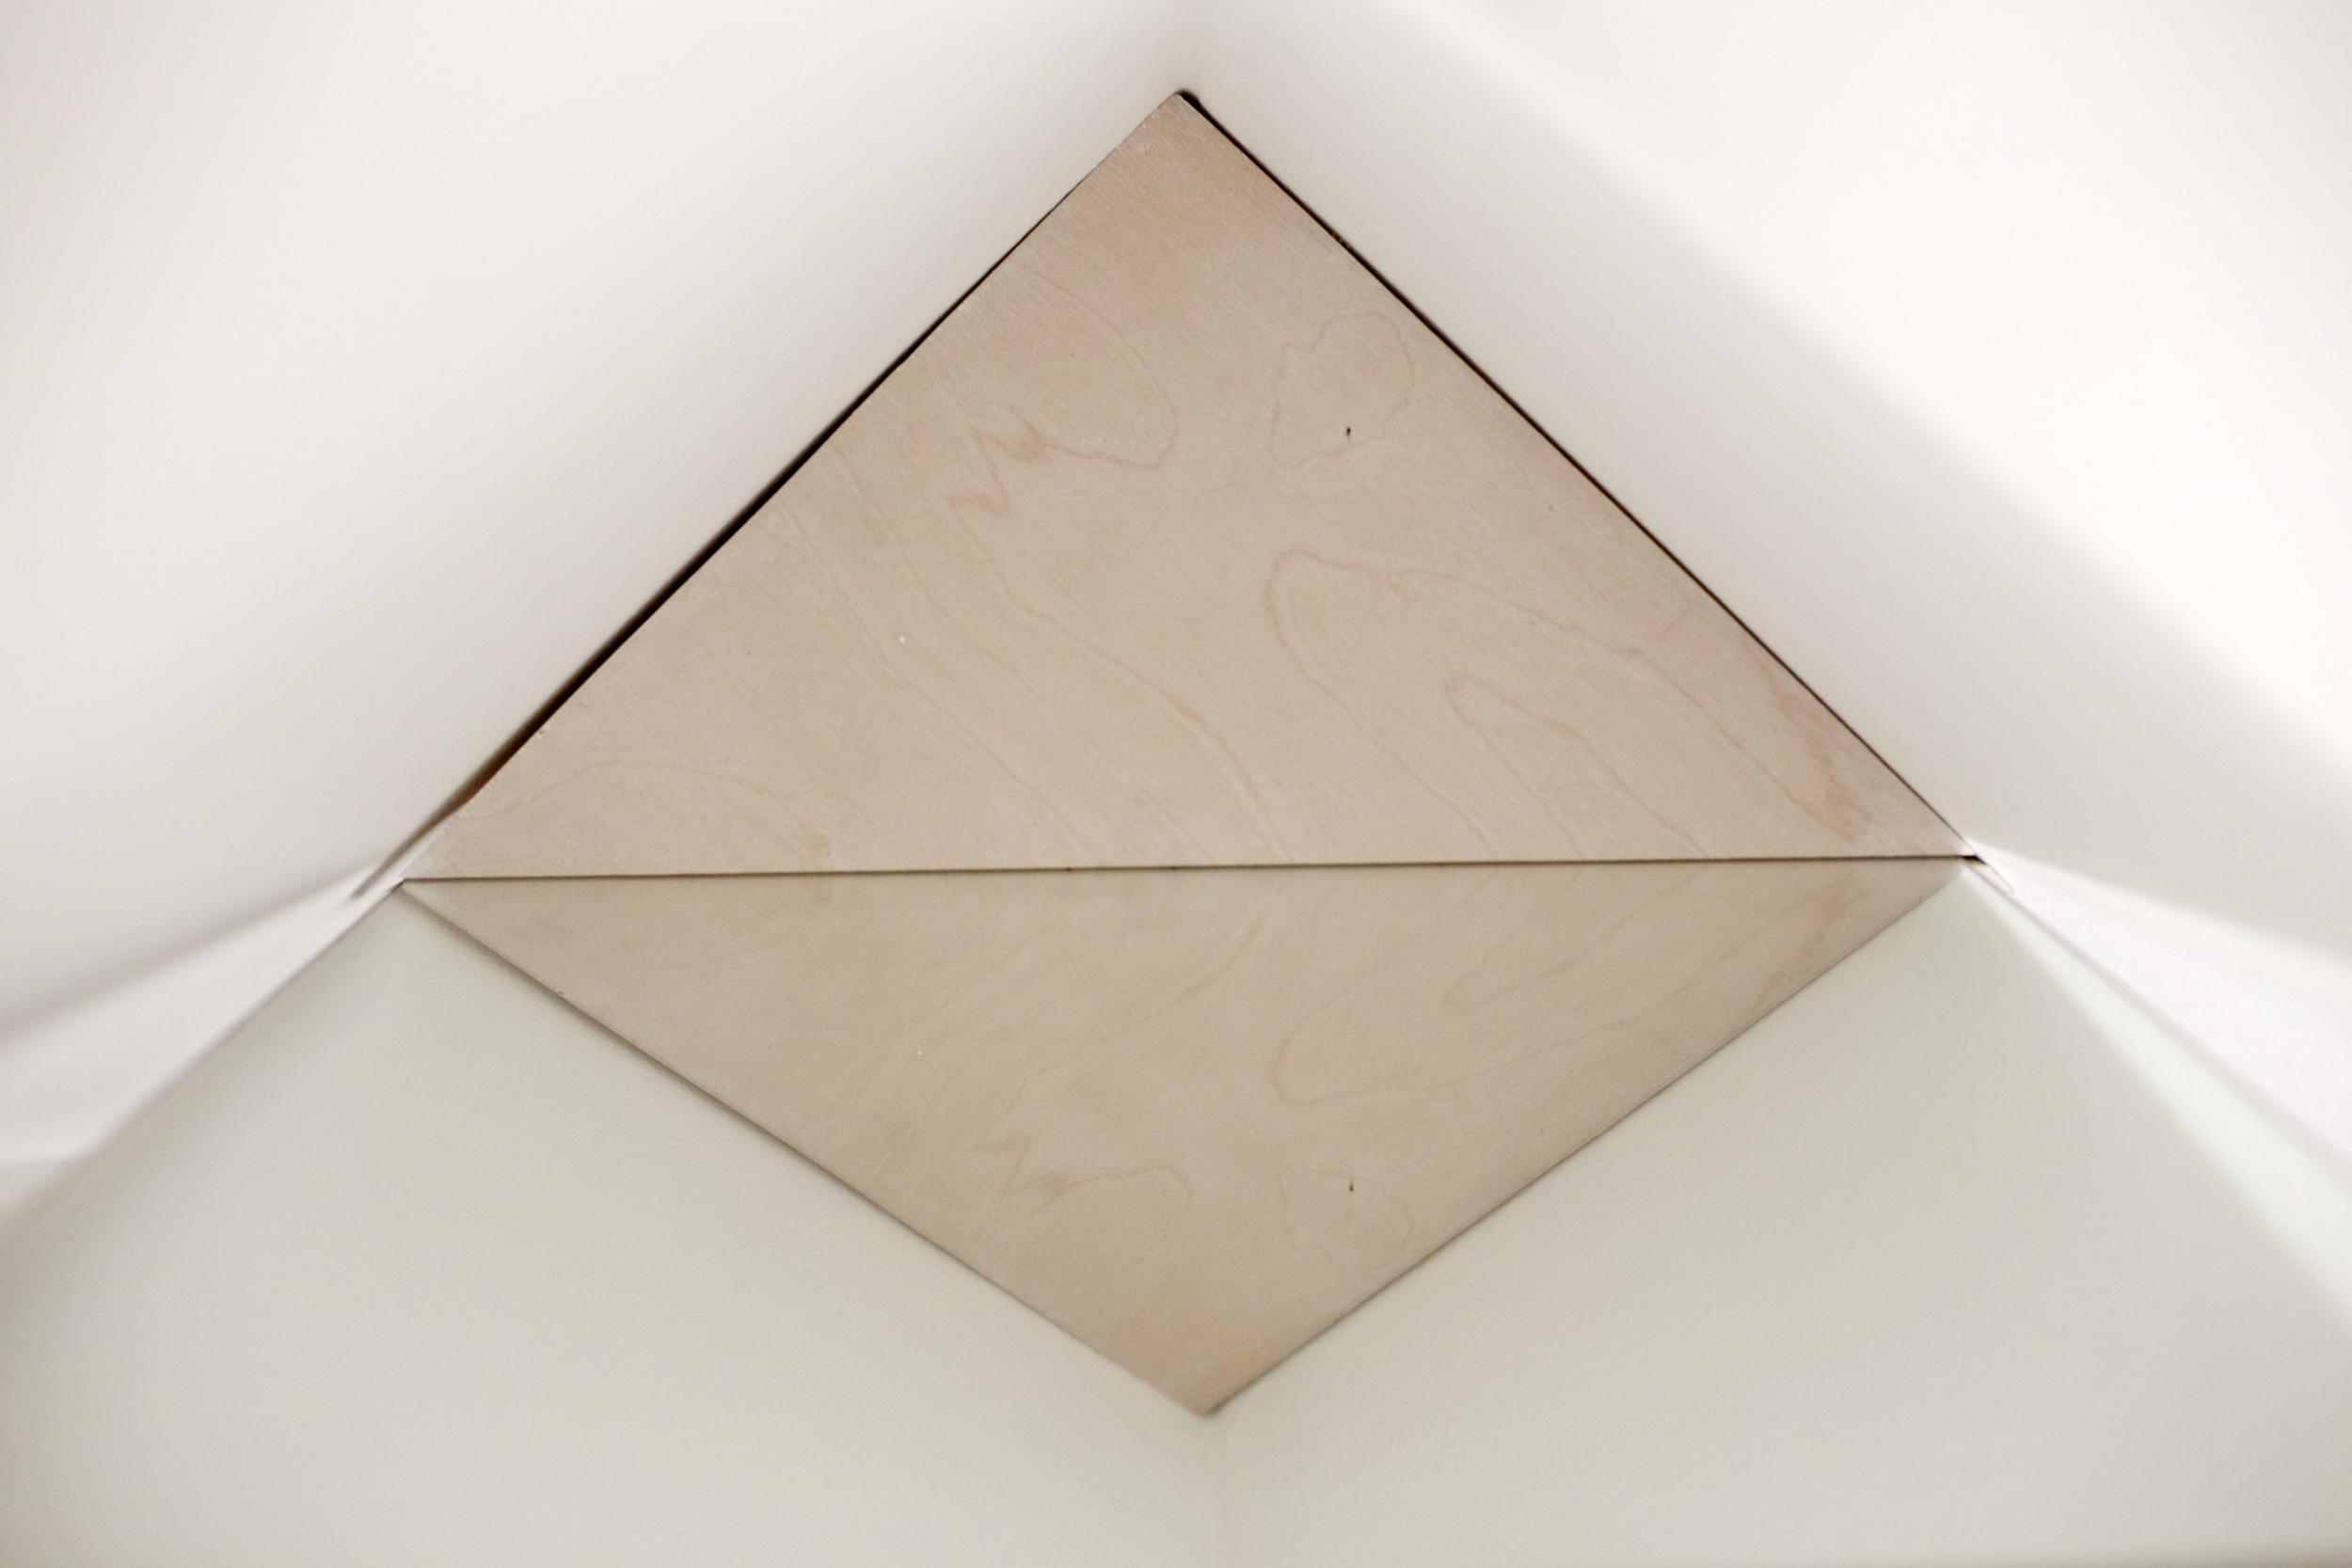 Tool for Contemplating Corners (navel-gazer)  2015 [immersive sculpture]